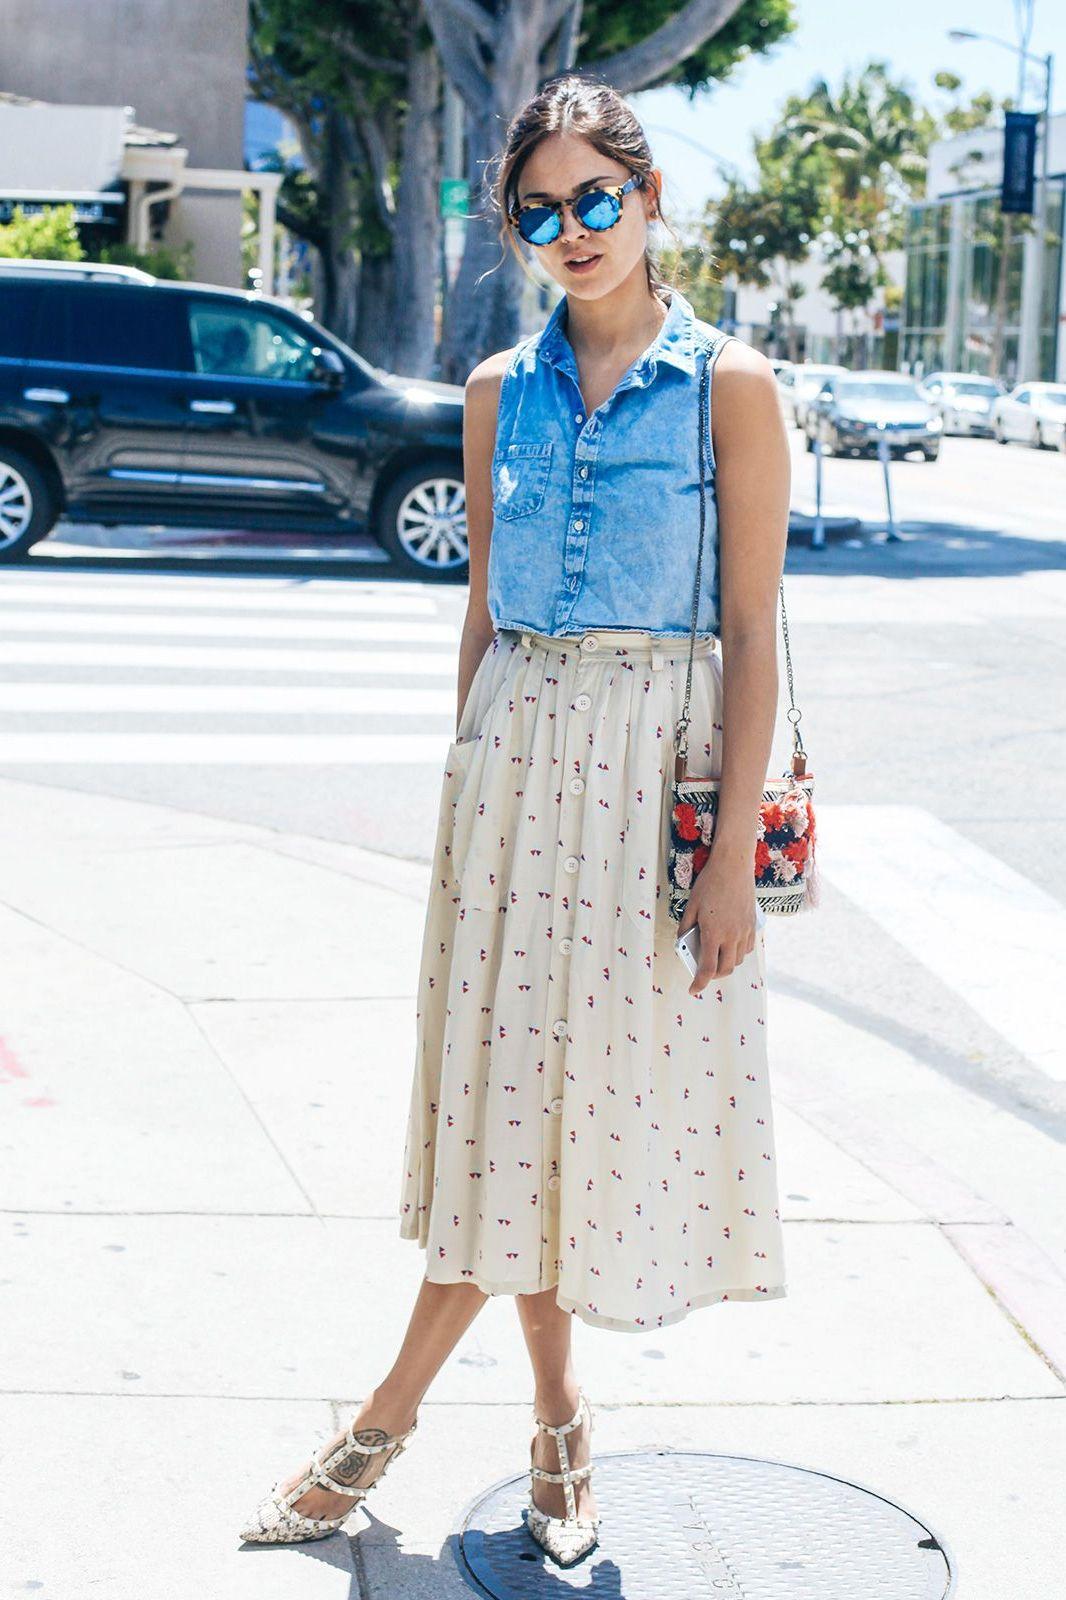 Best Midi Skirts For Summer 2020 – WardrobeFocus.com